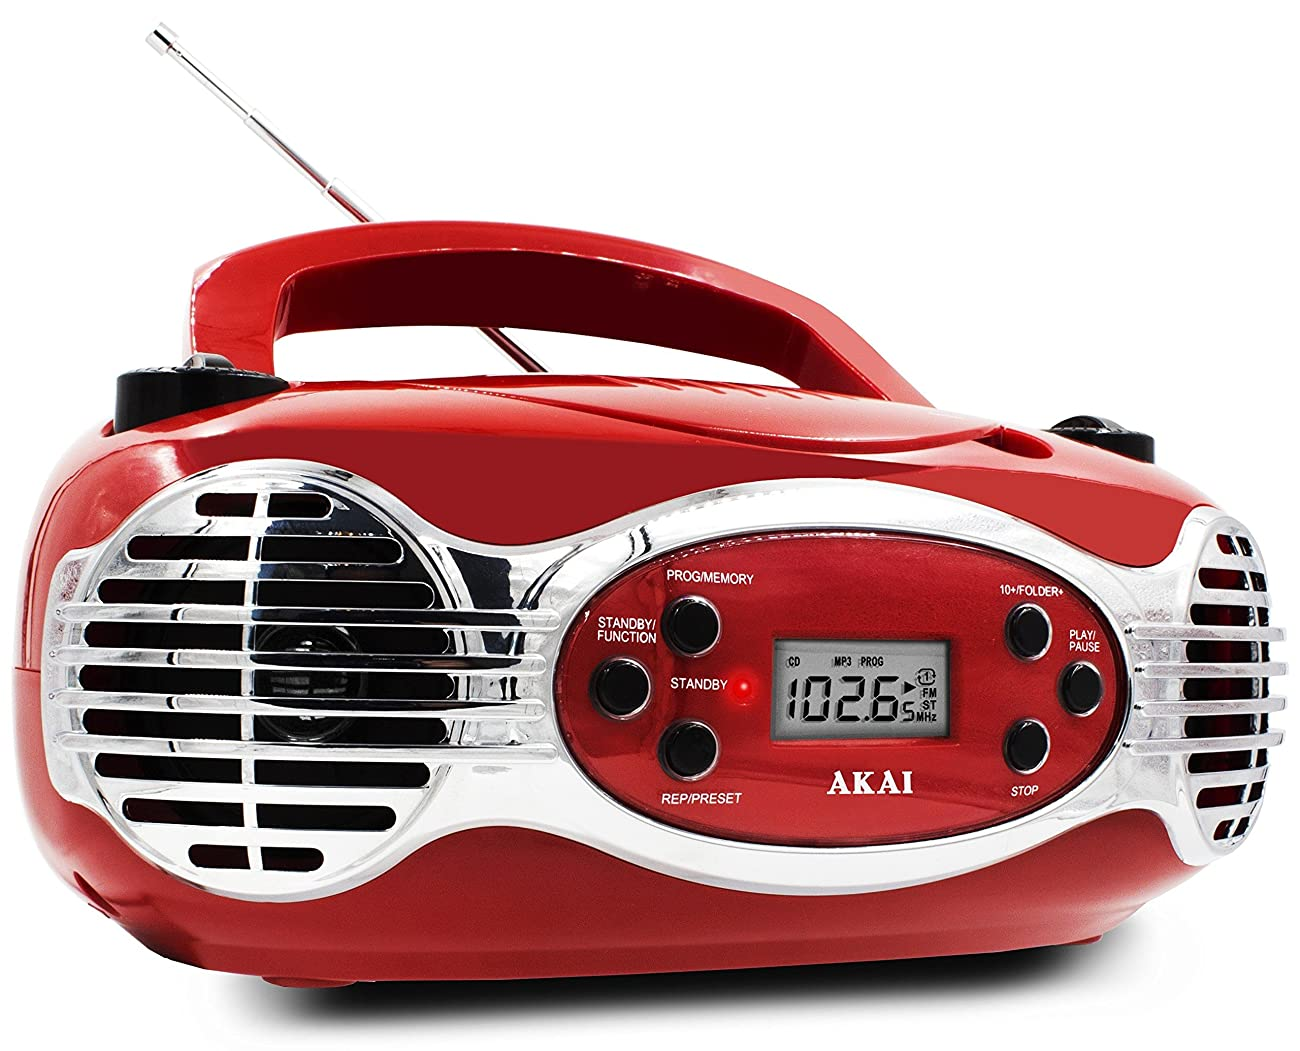 Akai CE2200R CD Boombox FM PLL Radio, Red 2